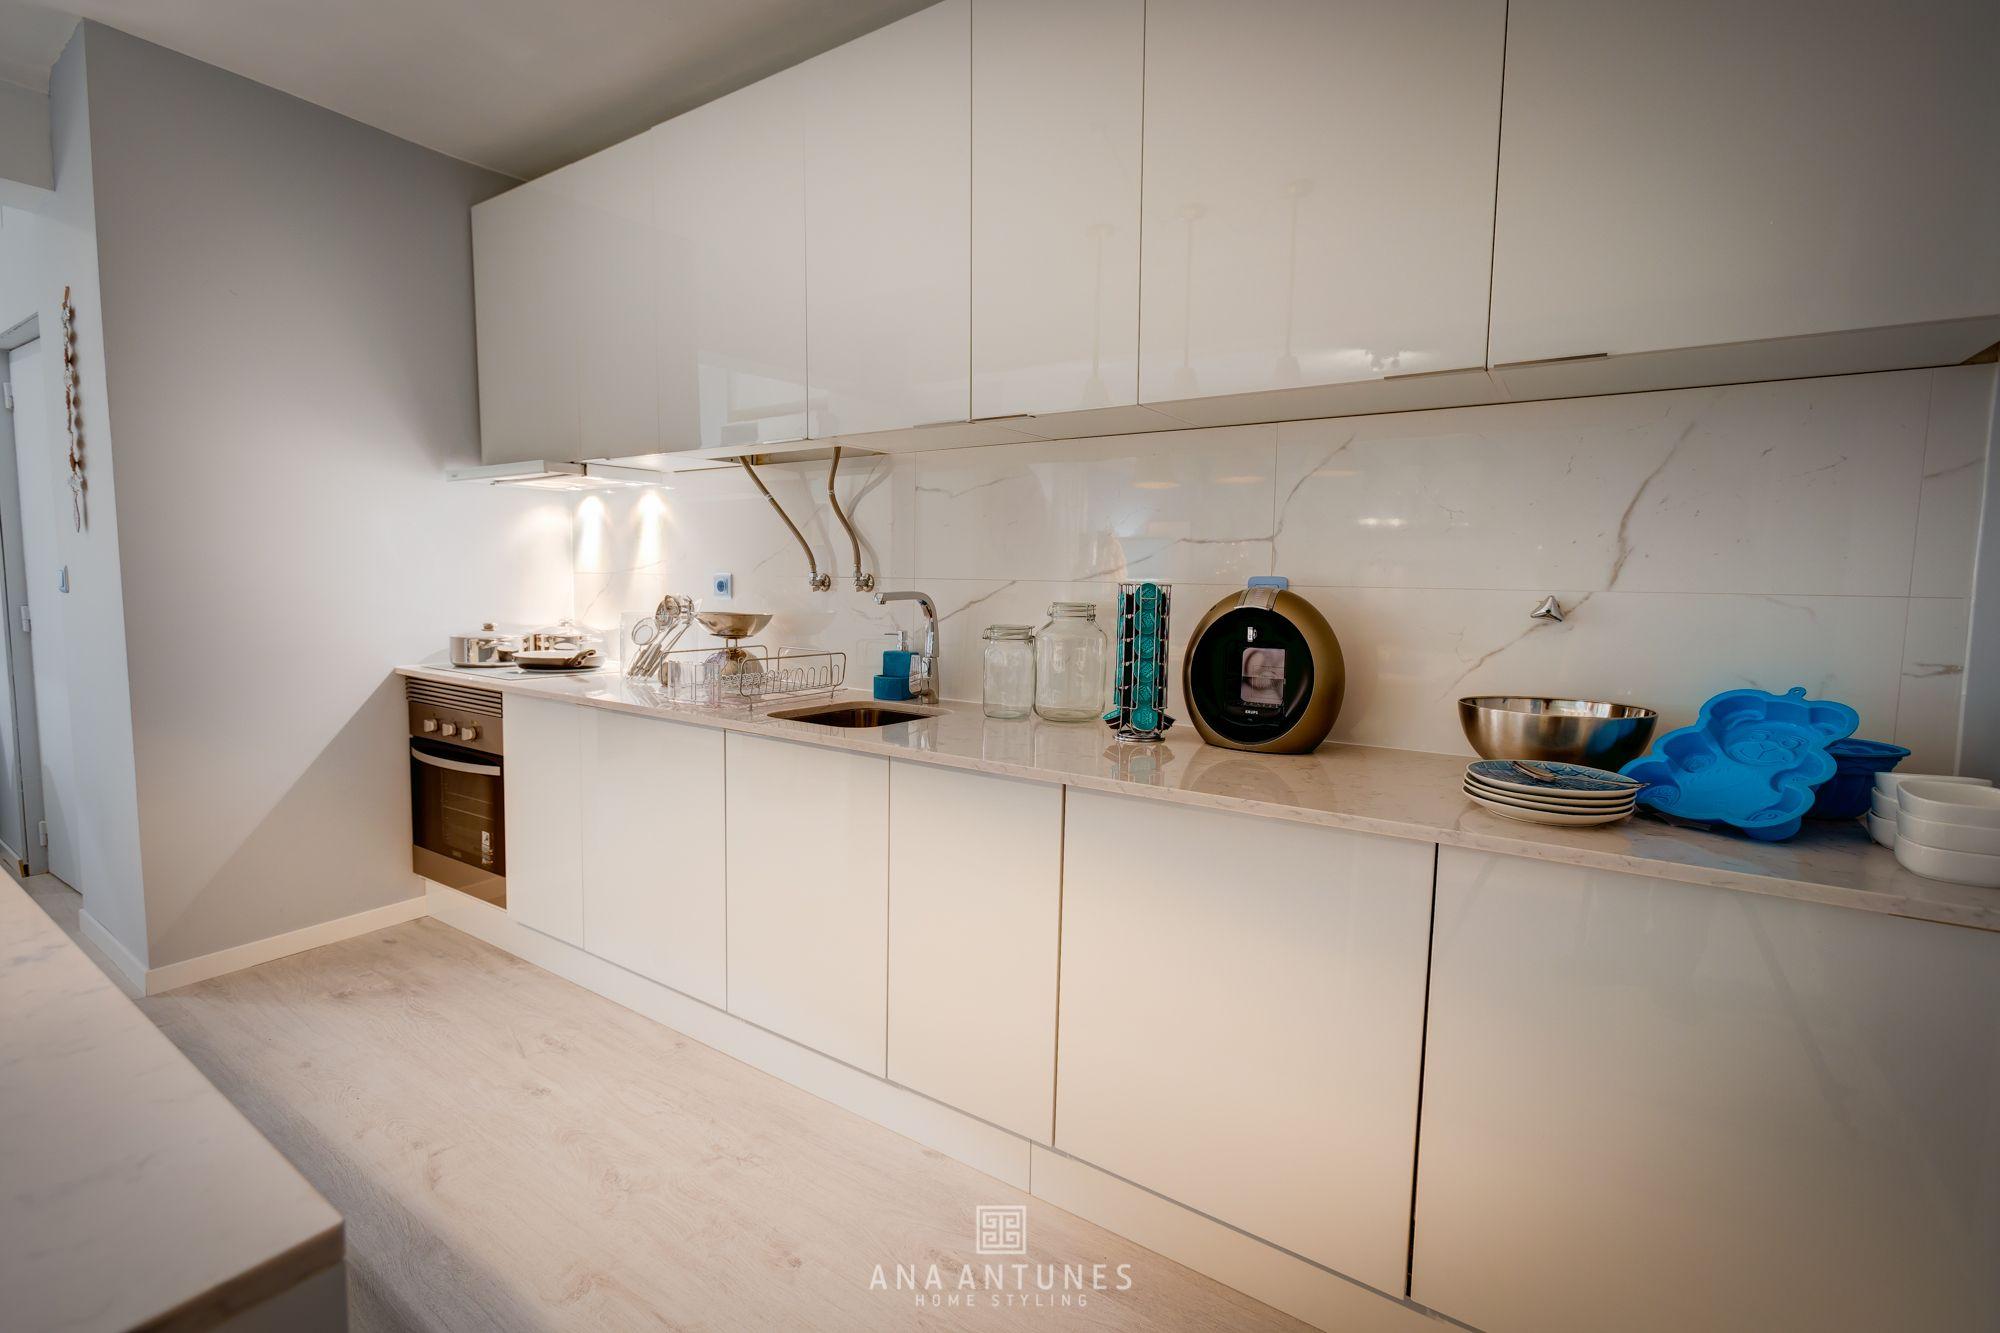 Ana Antunes   Cozinha   Kitchen   Blue   White Cabinets   Modern    Contemporary   Part 96